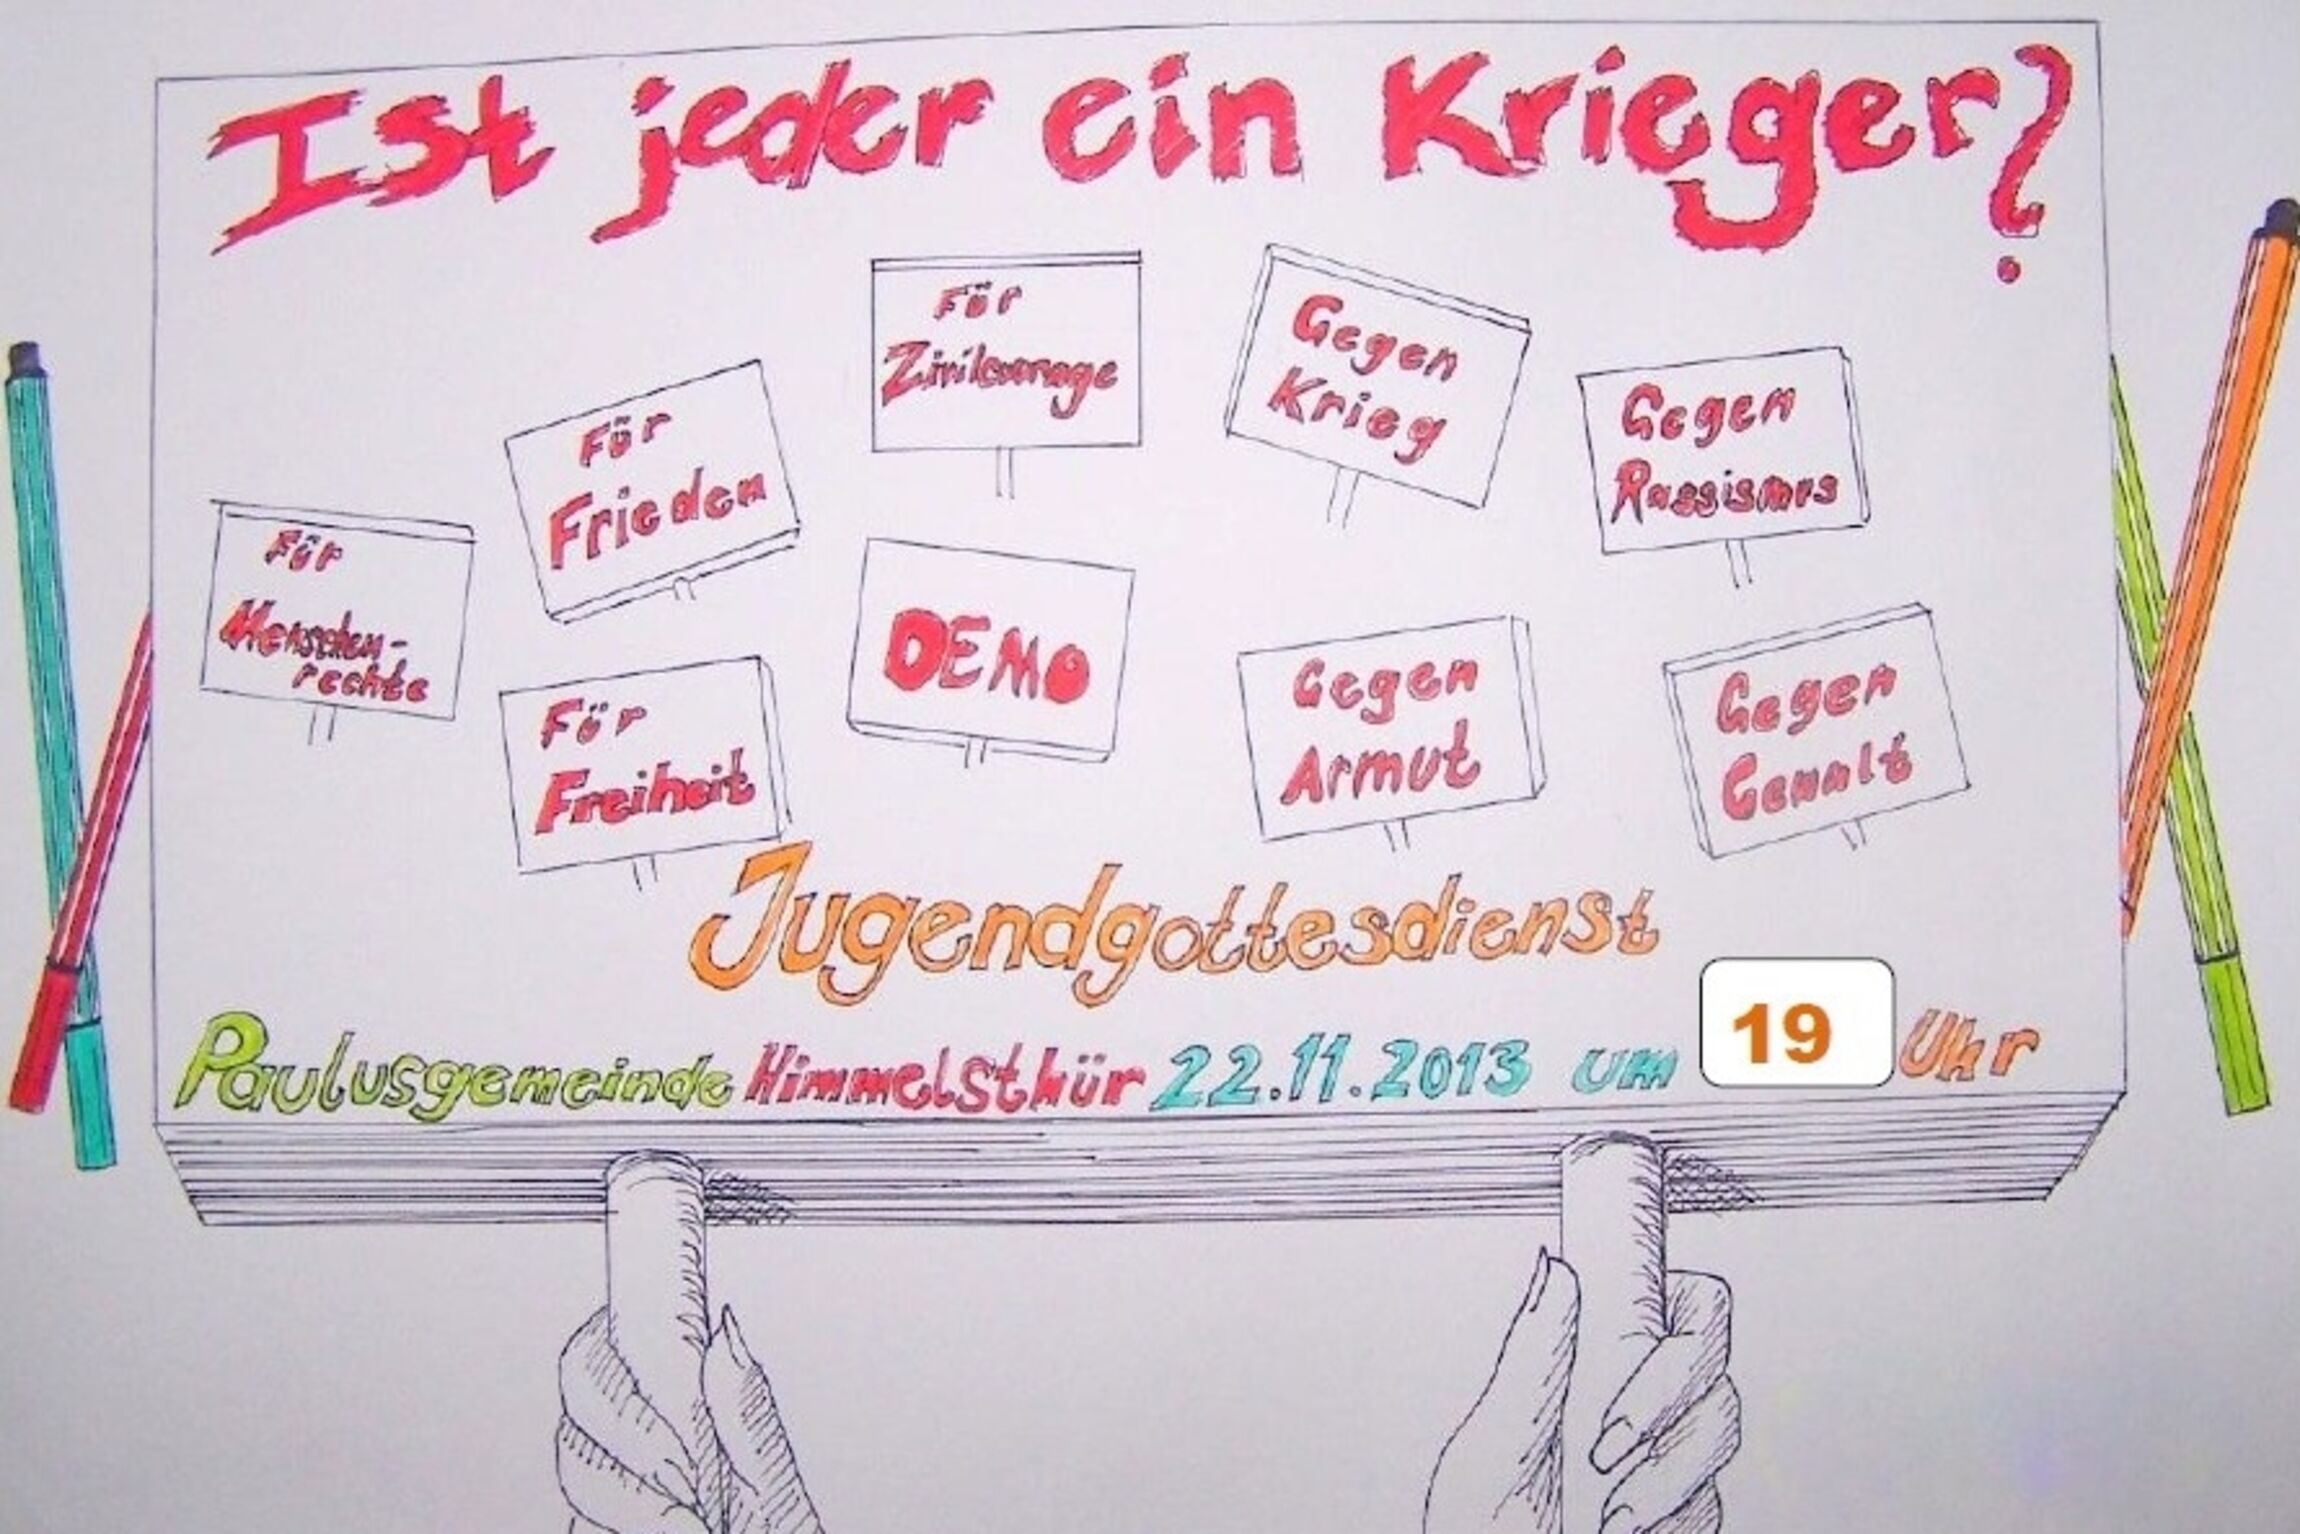 Plakat Jugendgottesdienst